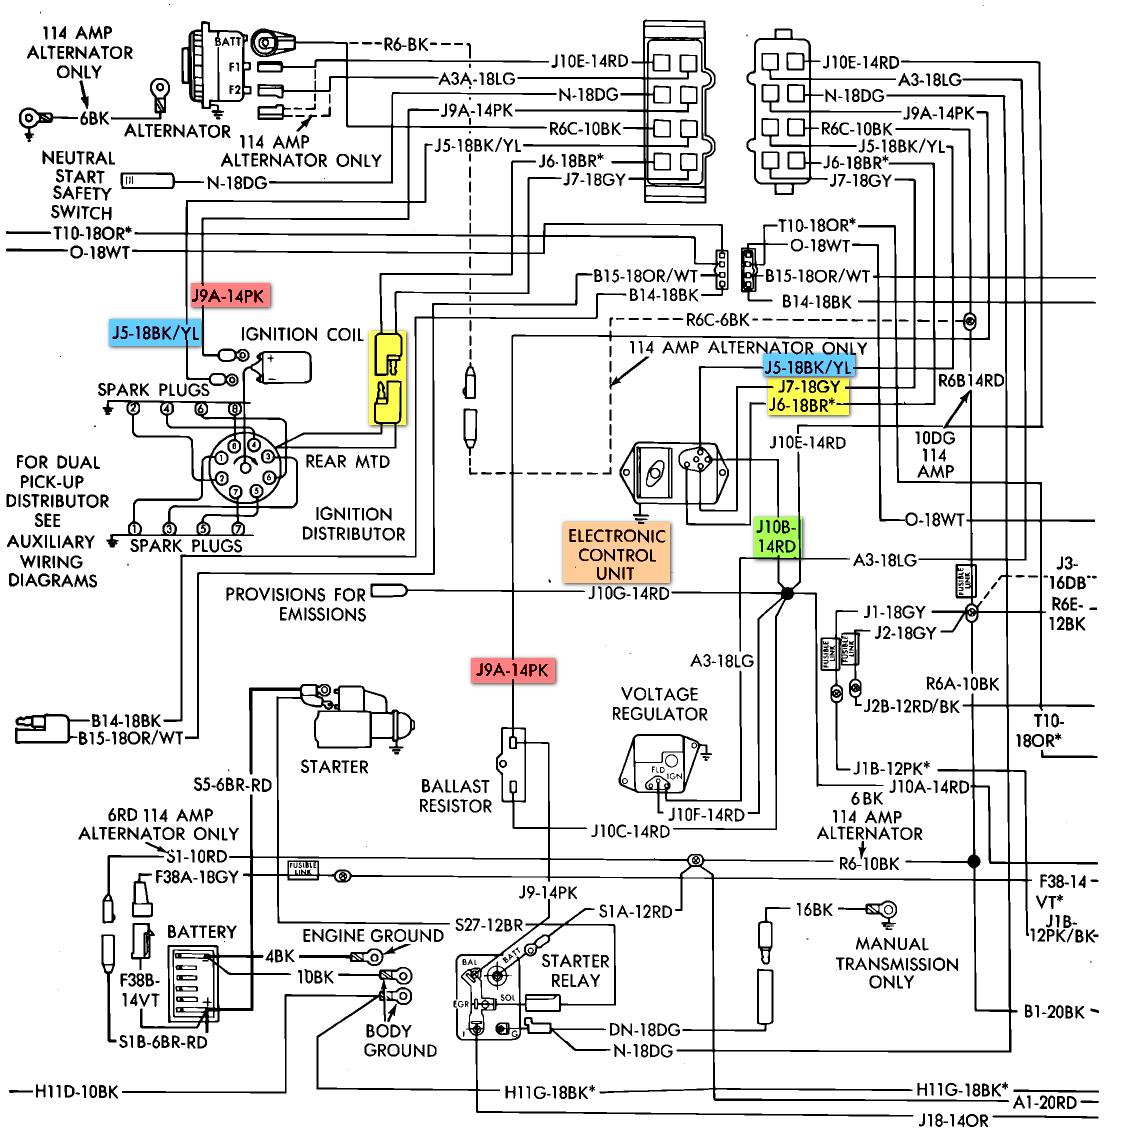 1980 Plymouth Volare Engine Harness Diagram Wiring Schematic - Genset  Control Wiring Diagram - sportster-wiring.tukune.jeanjaures37.fr | 1980 Plymouth Volare Engine Harness Diagram Wiring Schematic |  | Wiring Diagram Resource